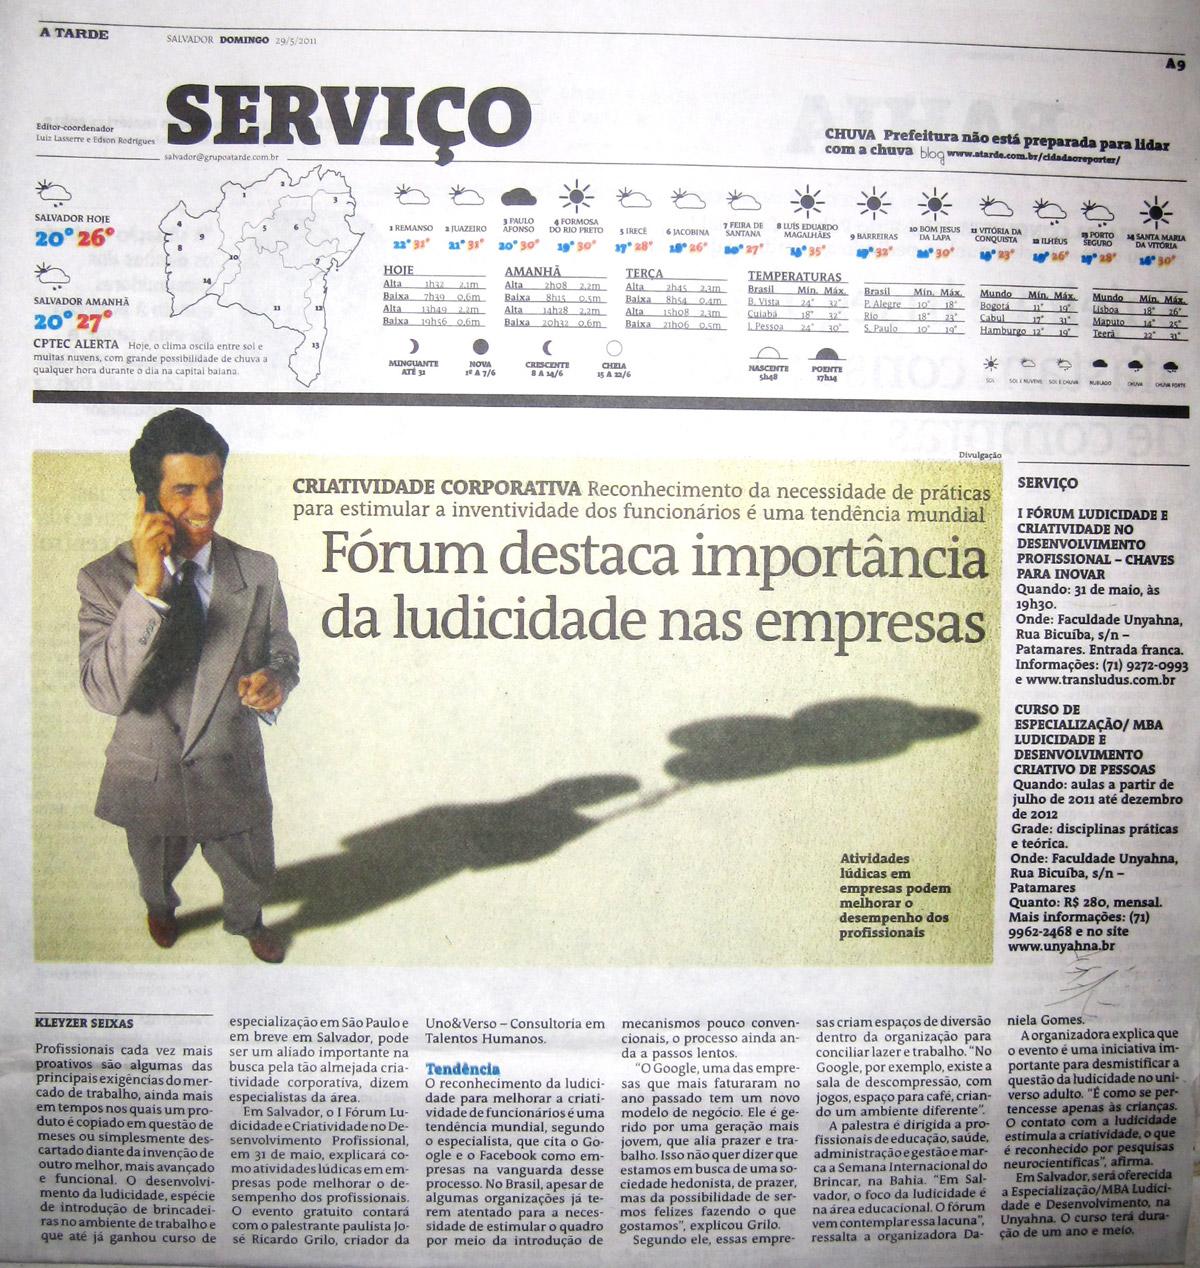 29-05-2011. Jornal A Tarde